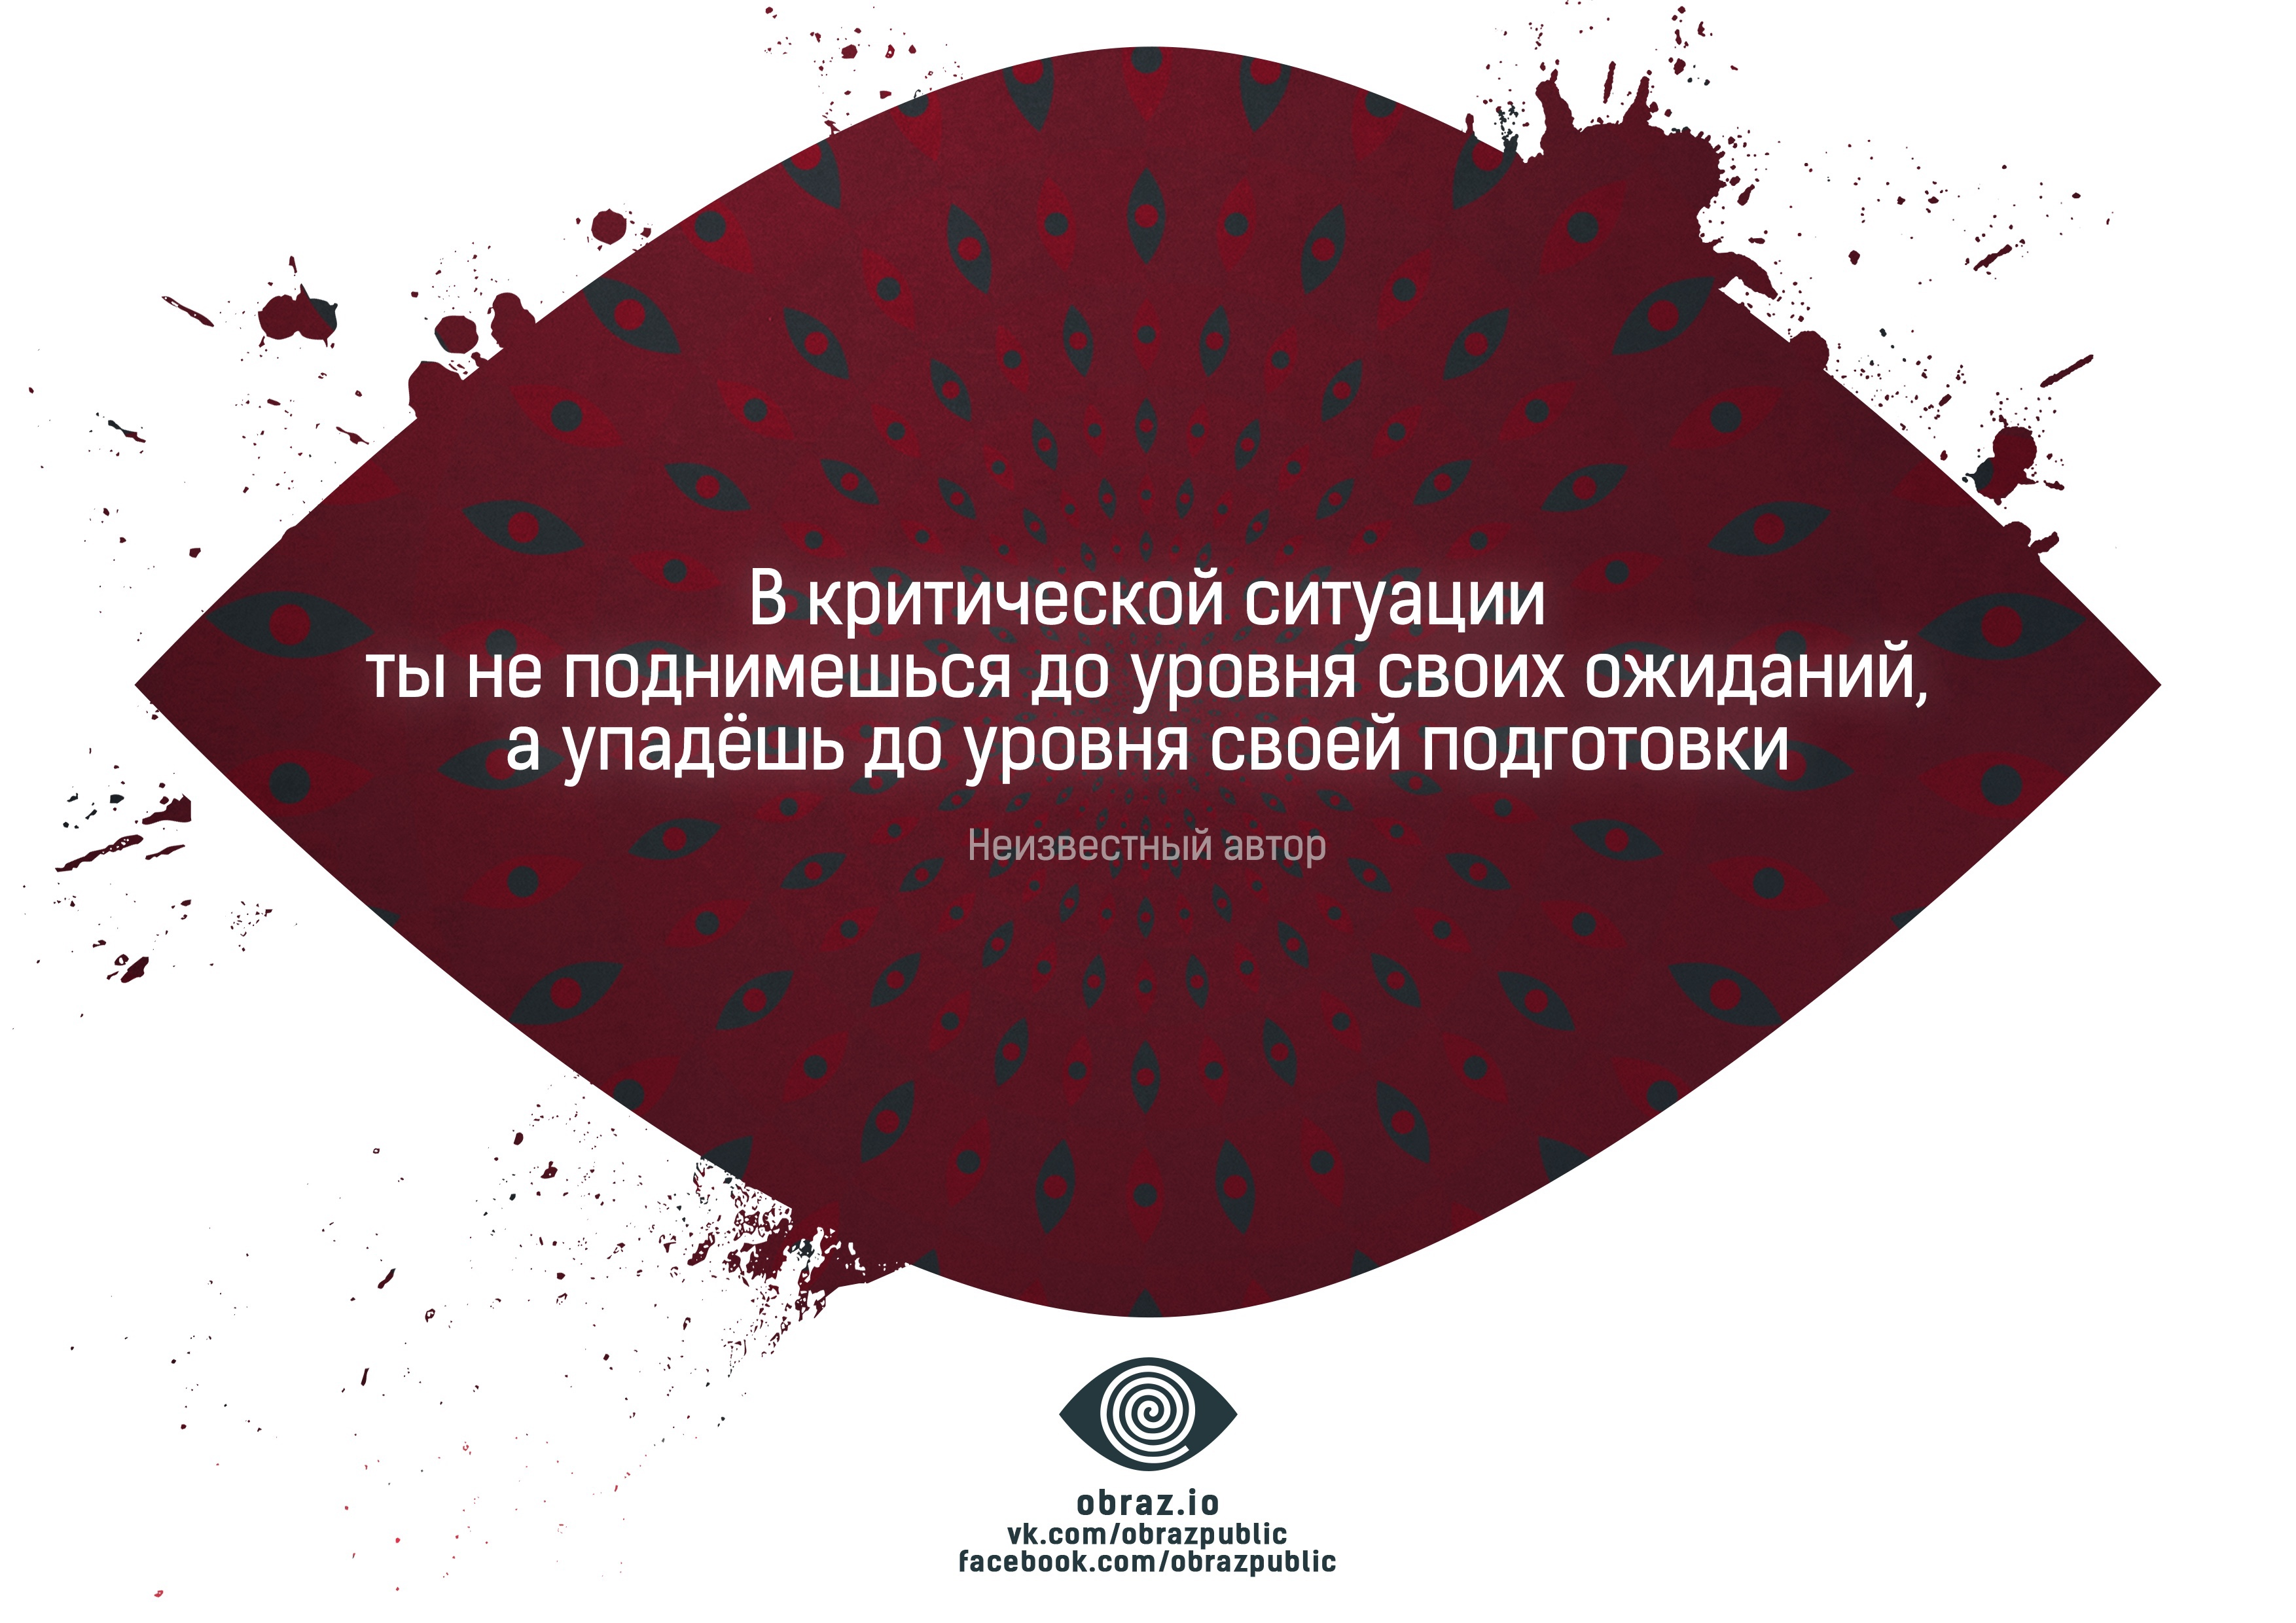 Email:learningkurakov@gmail com3292 1udmnsq.32spyfd2t9